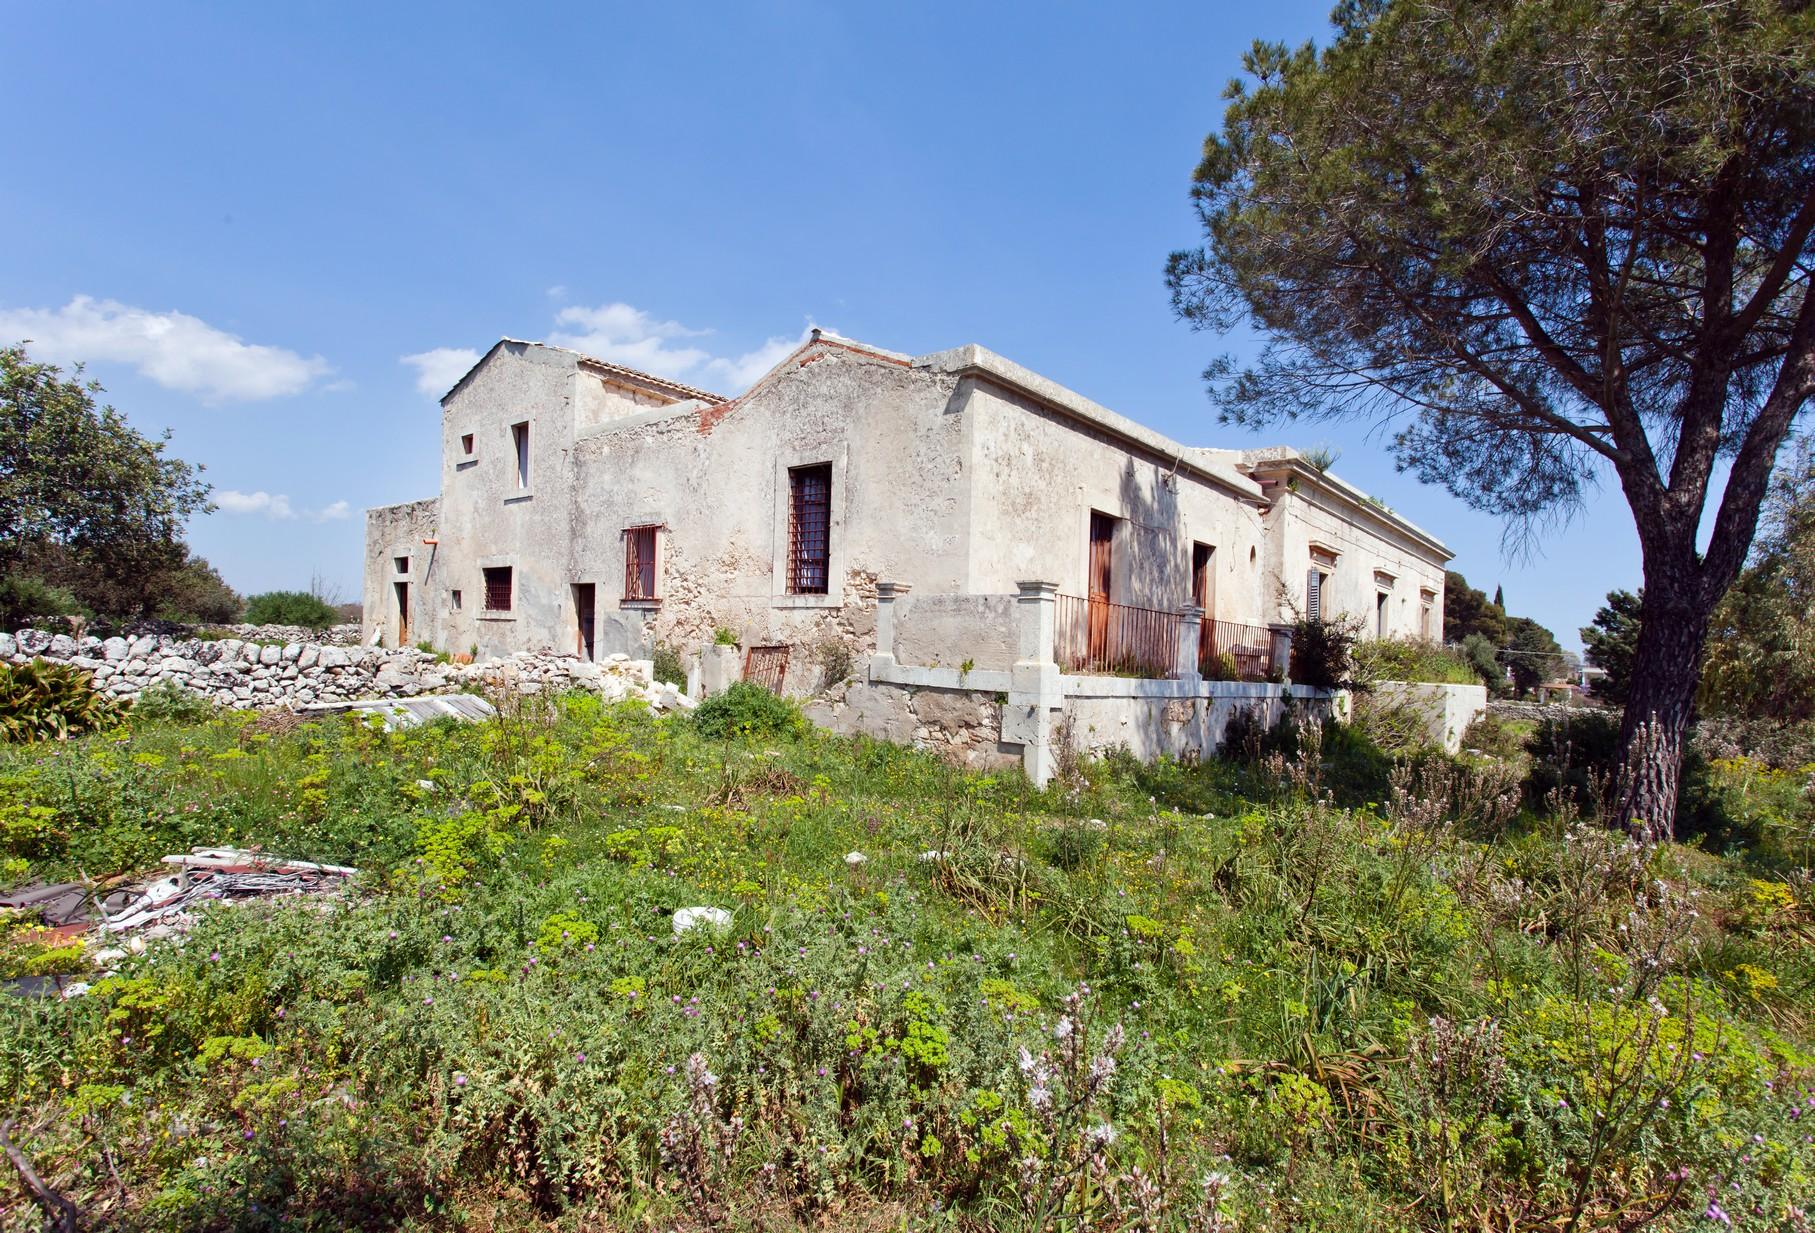 Casa indipendente in Vendita a Noto: 5 locali, 1000 mq - Foto 11